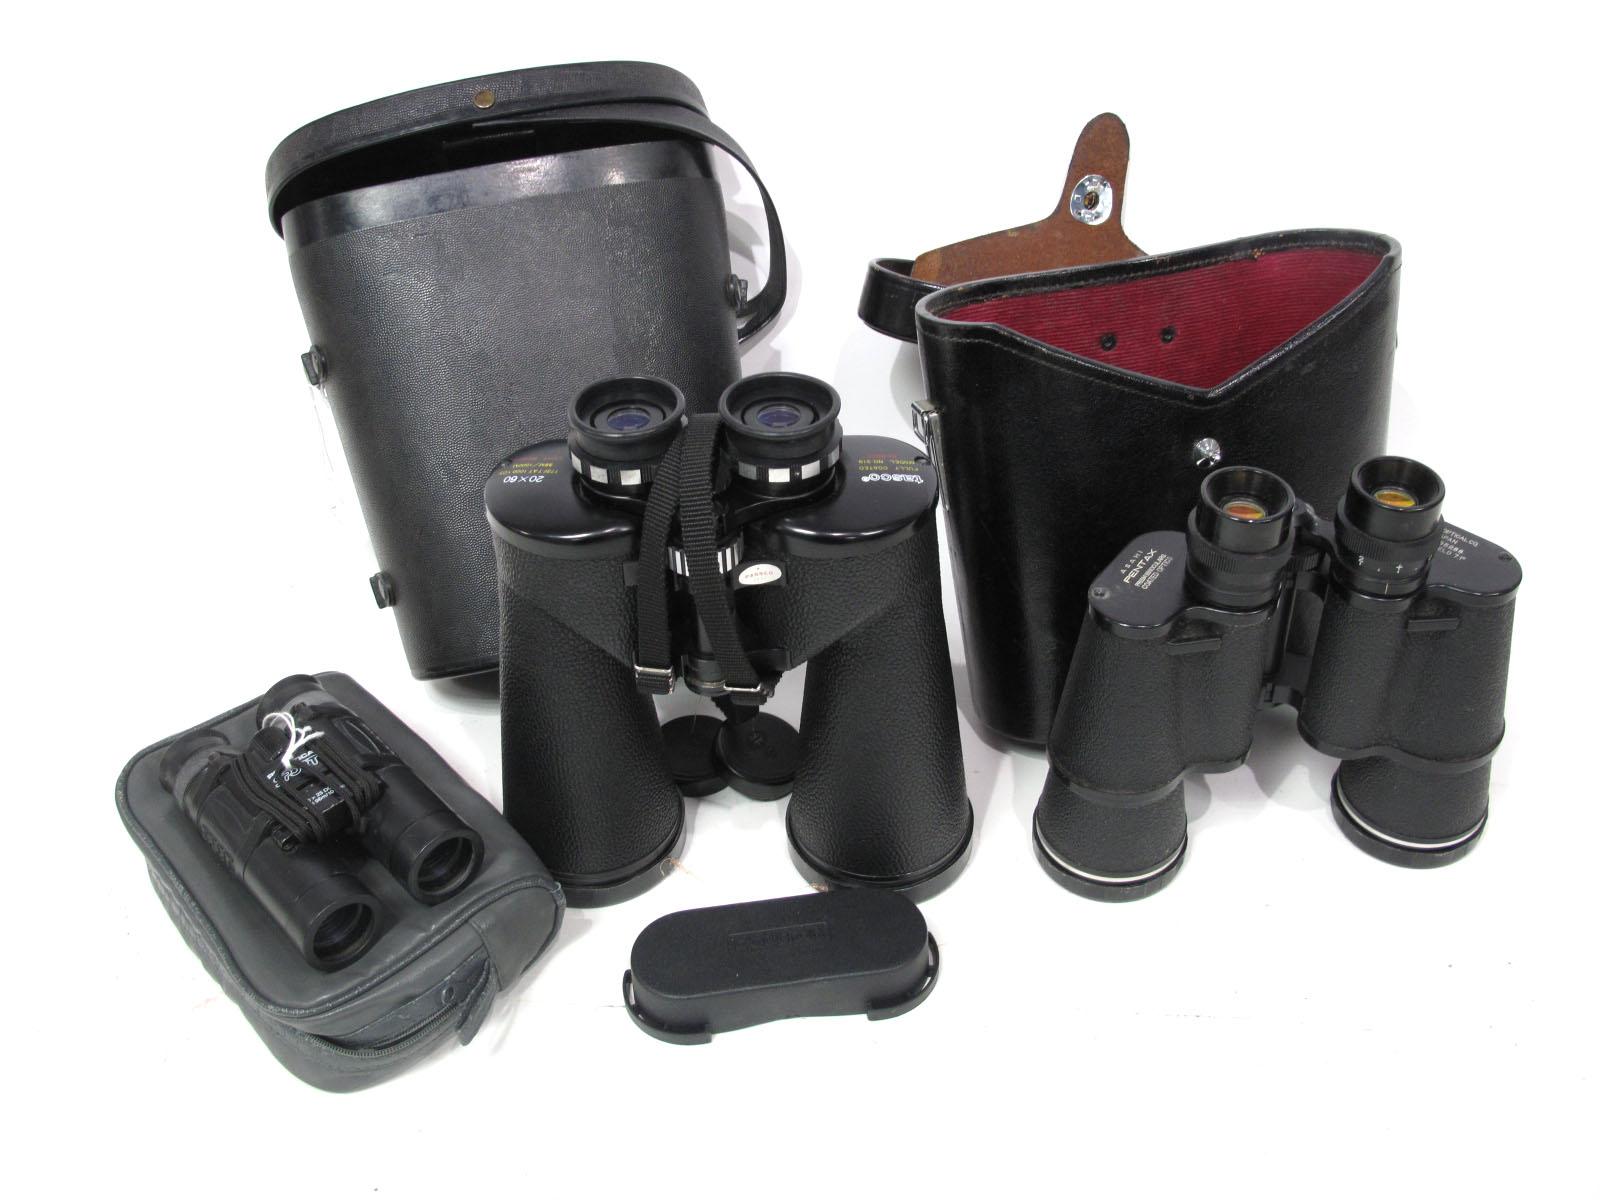 Binoculars Tasco Model No. 319, 20 x 60, fully coated in hard black case. Also Asahi Pentax 7 x 50